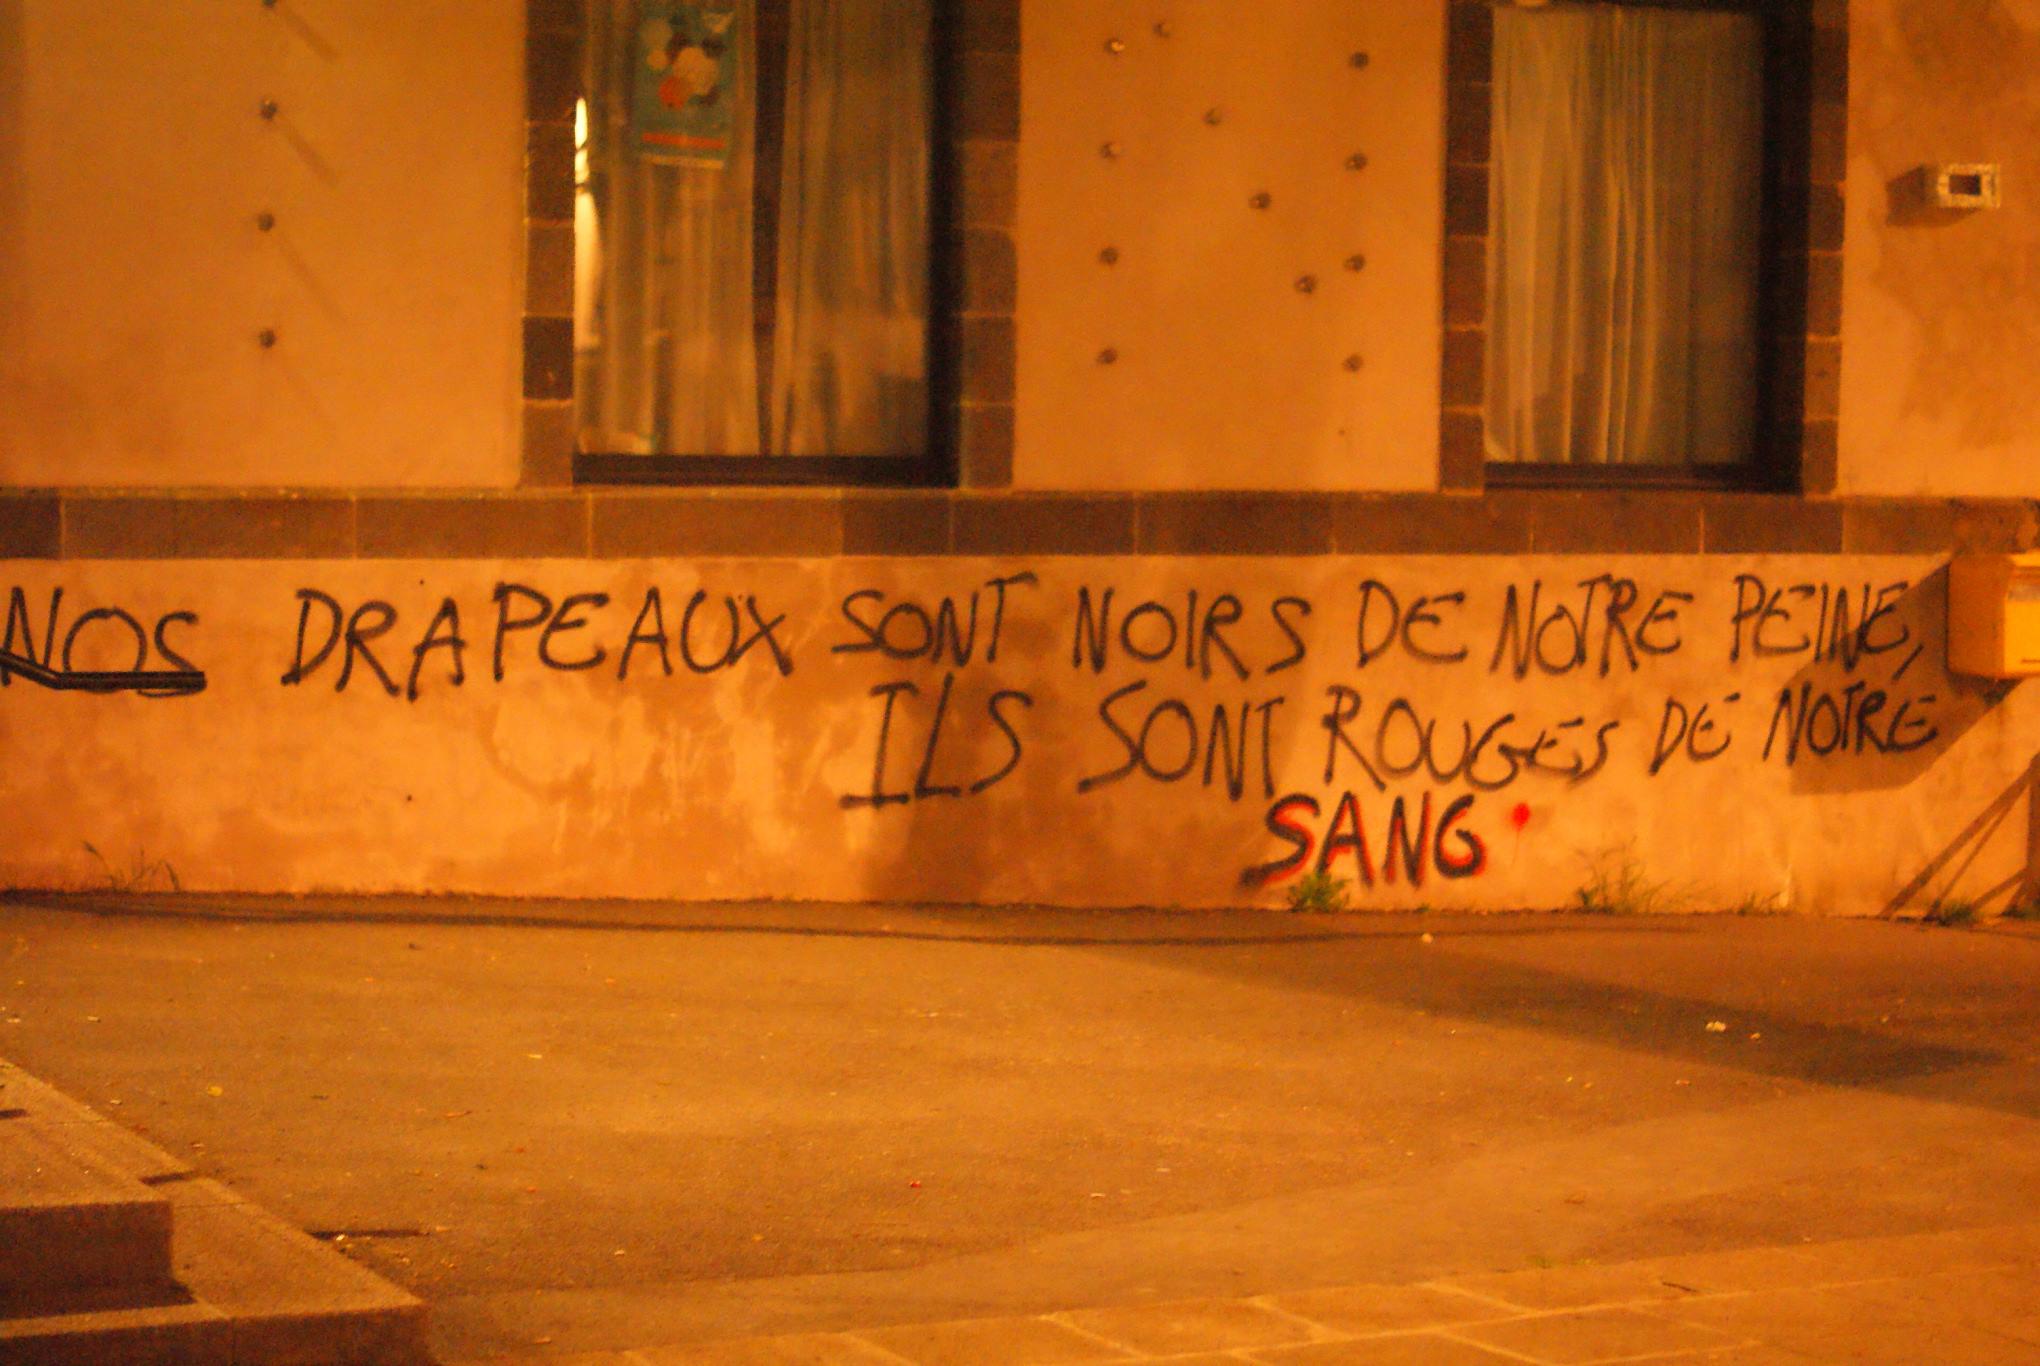 http://juralib.noblogs.org/files/2013/06/DSC00077.jpg